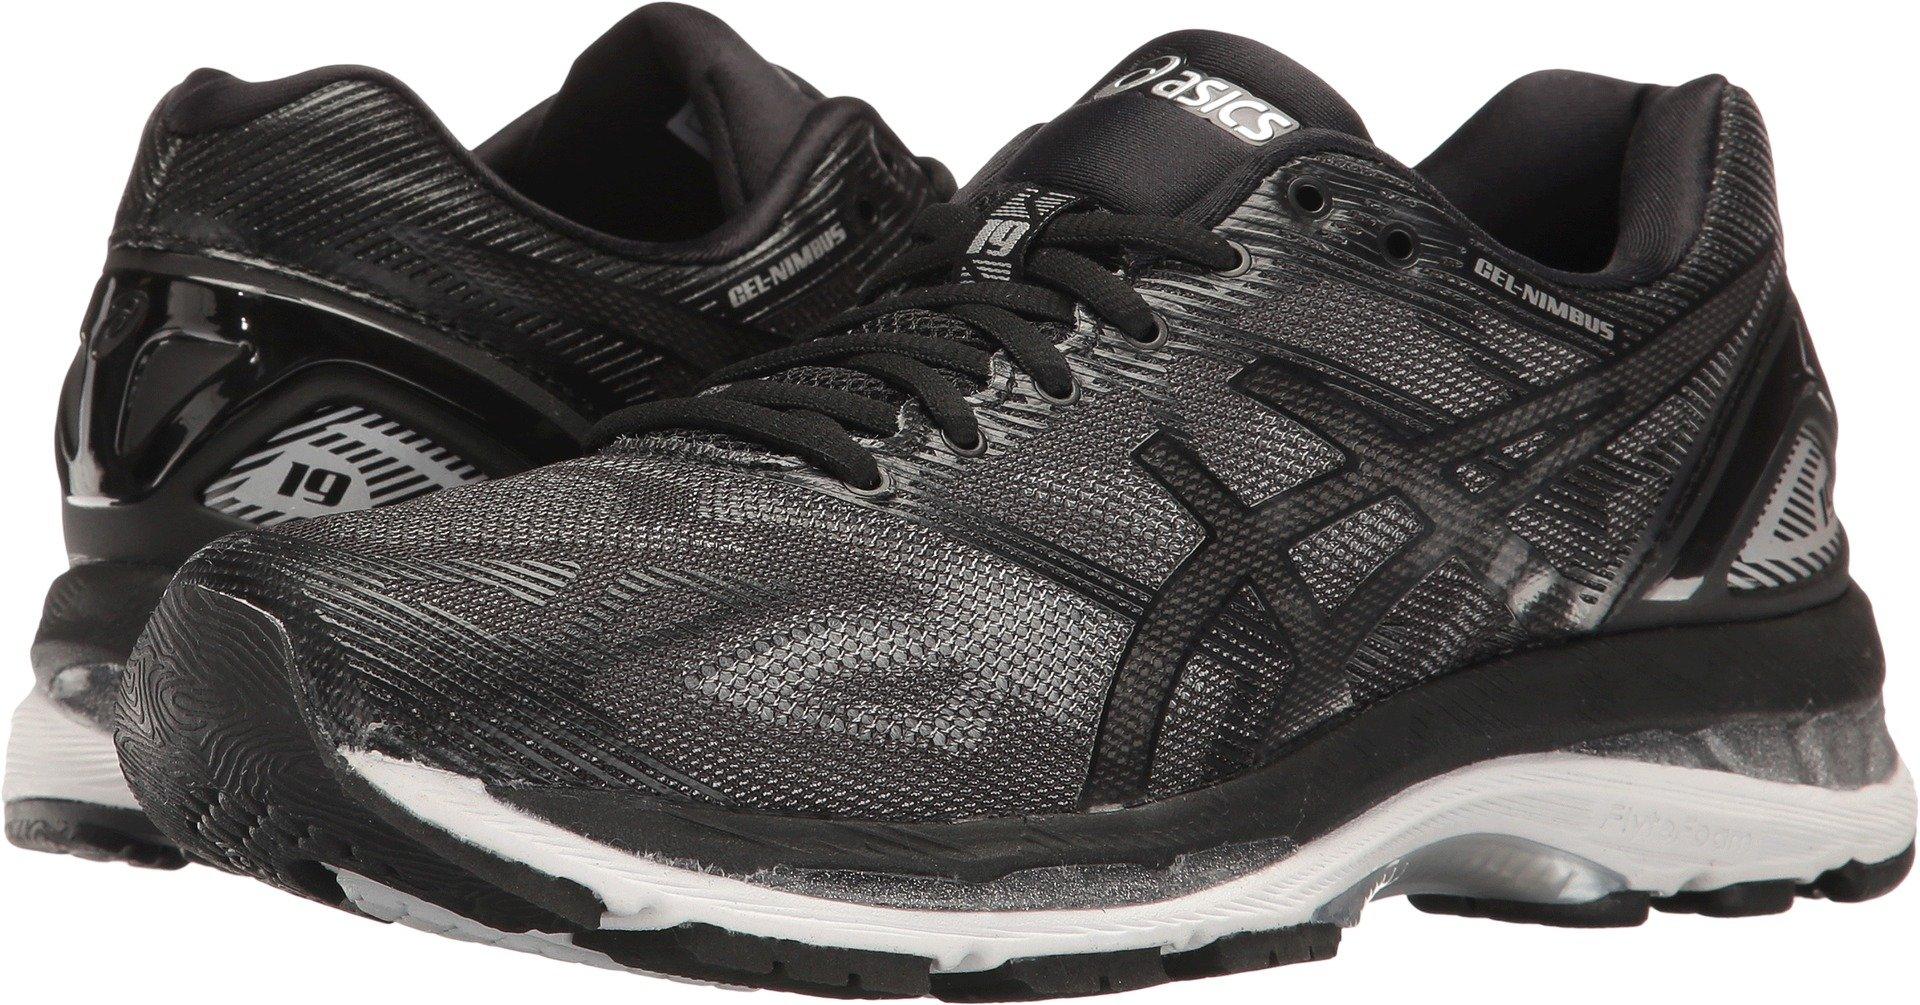 size 40 6a077 3a743 ASICS Women's Gel-Nimbus 19 Running Shoe, Black/Onyx/Silver, 7 M US